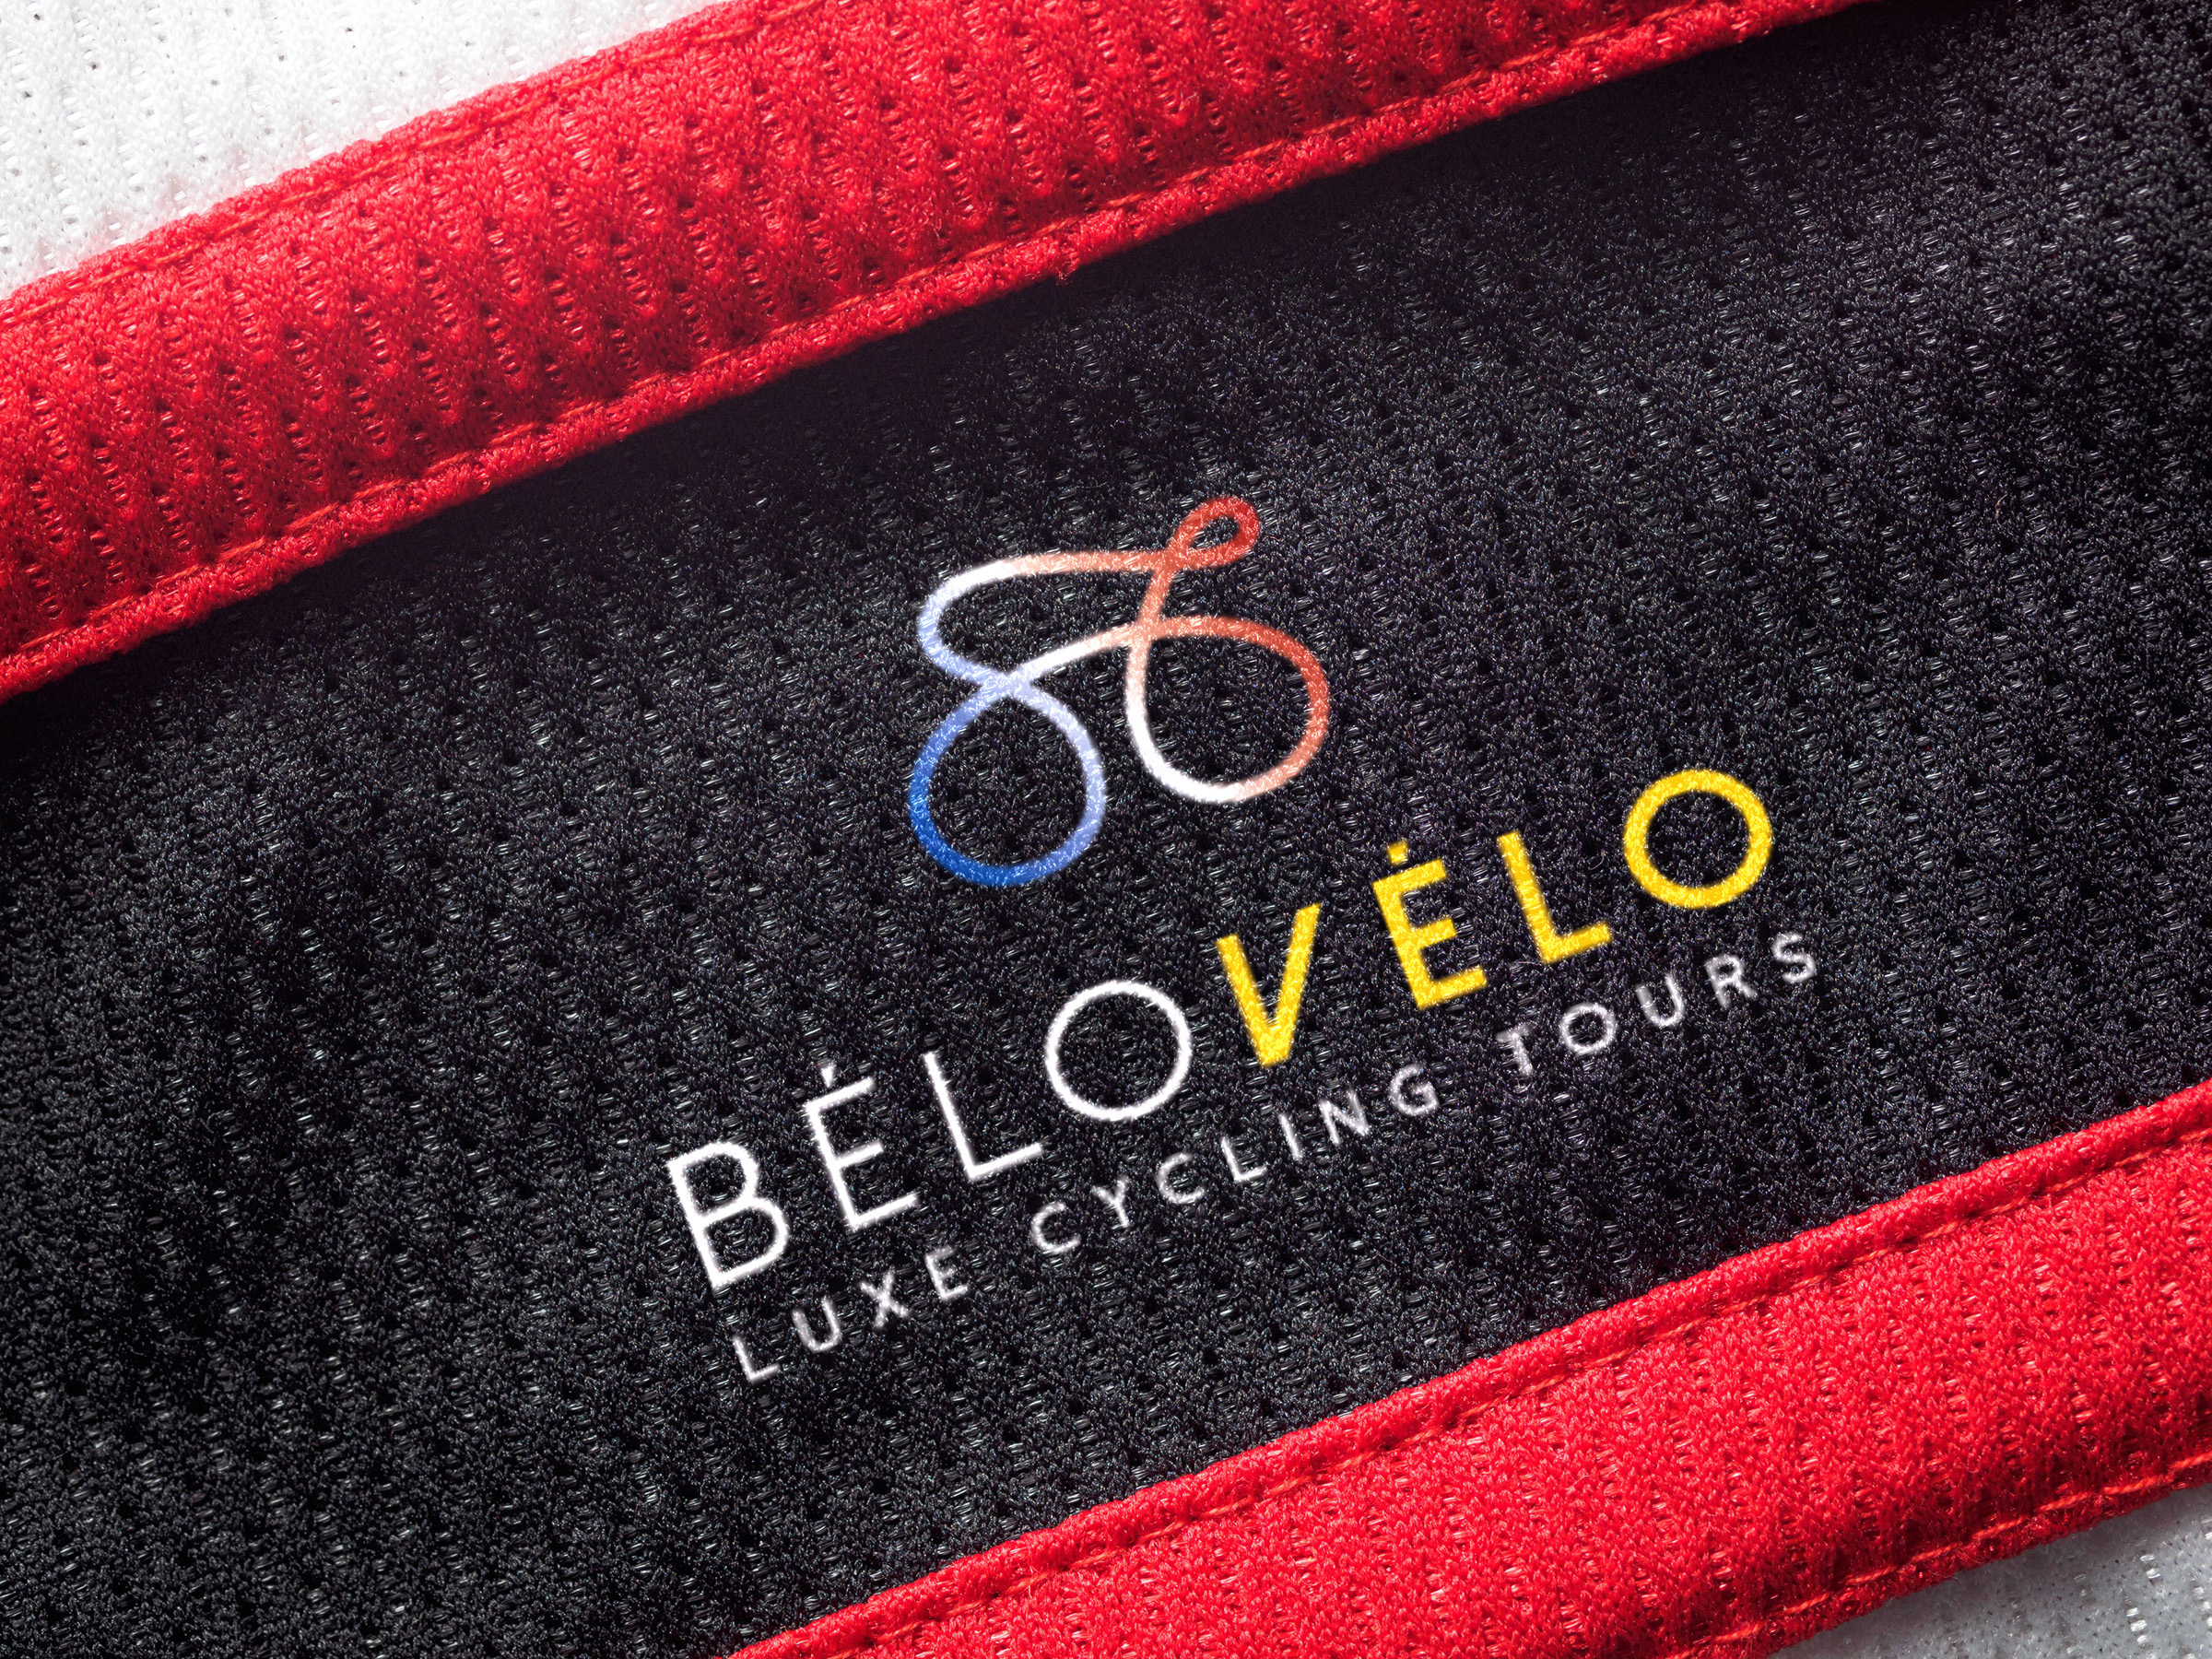 BÉLOVÉLO LUXE CYCLING TOURS